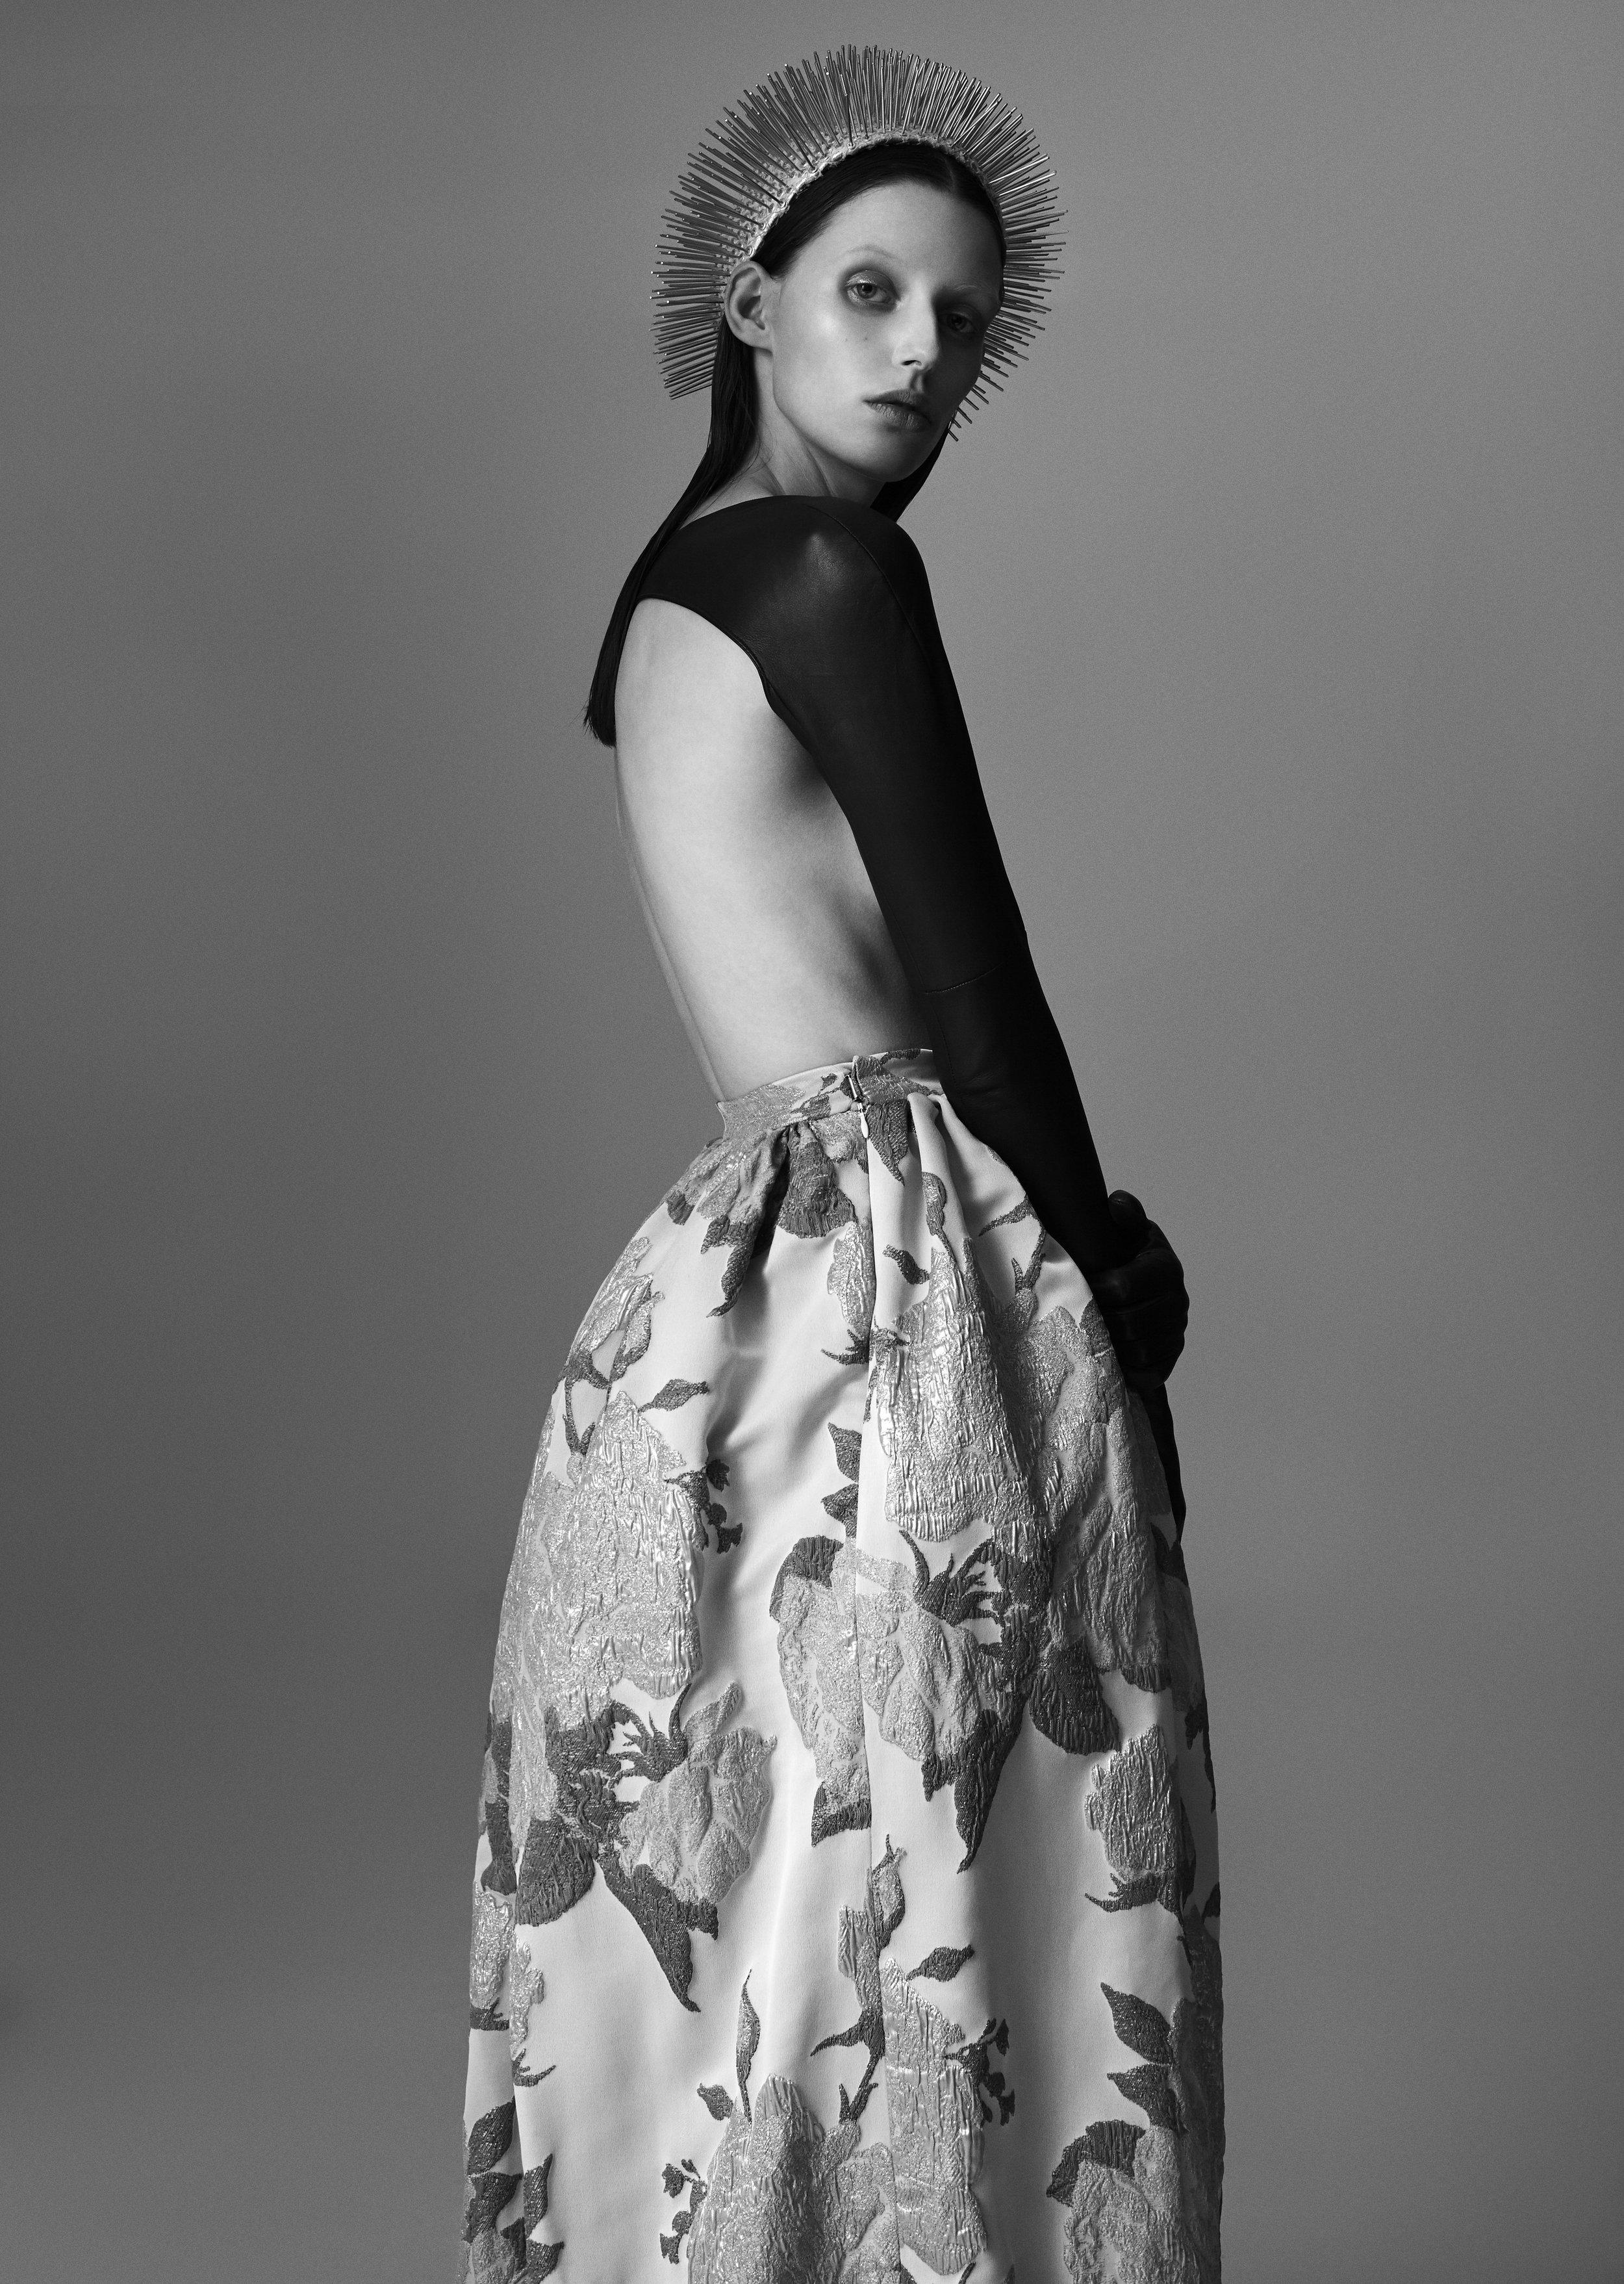 LéaNielsen_Vogue.it_04.jpg